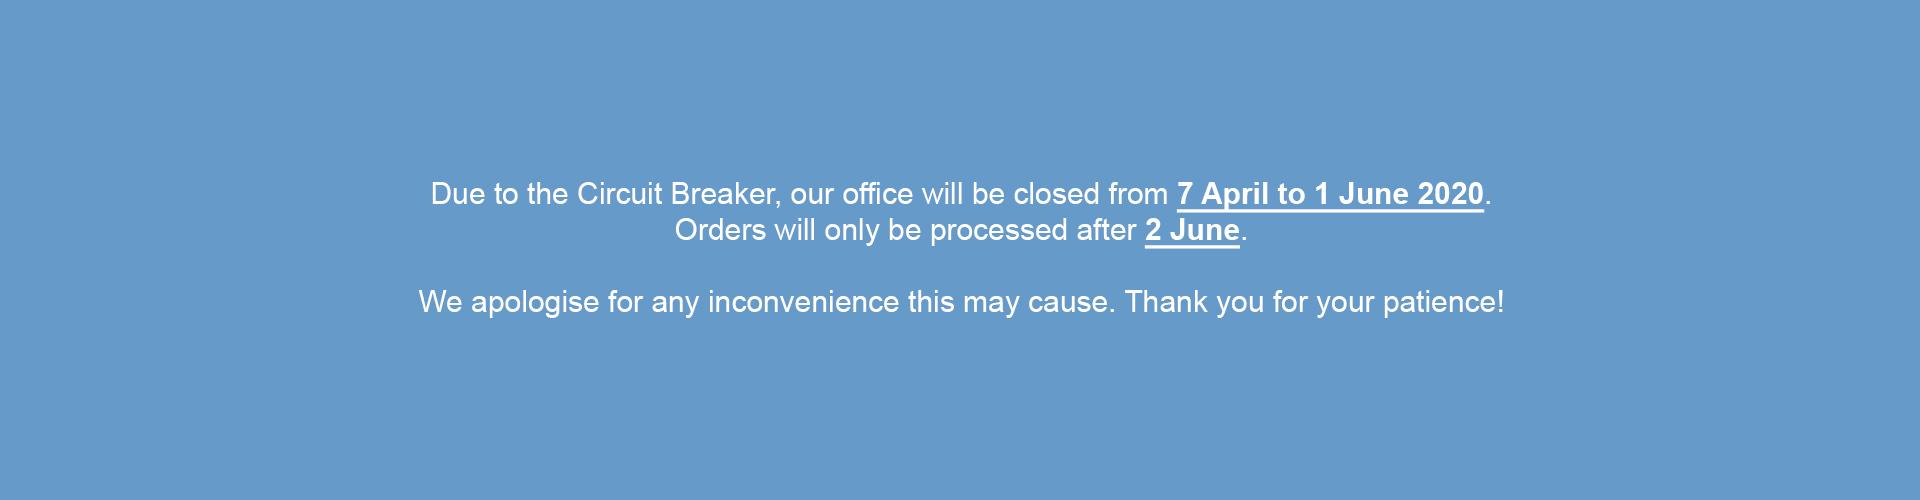 Circuit Breaker Notice